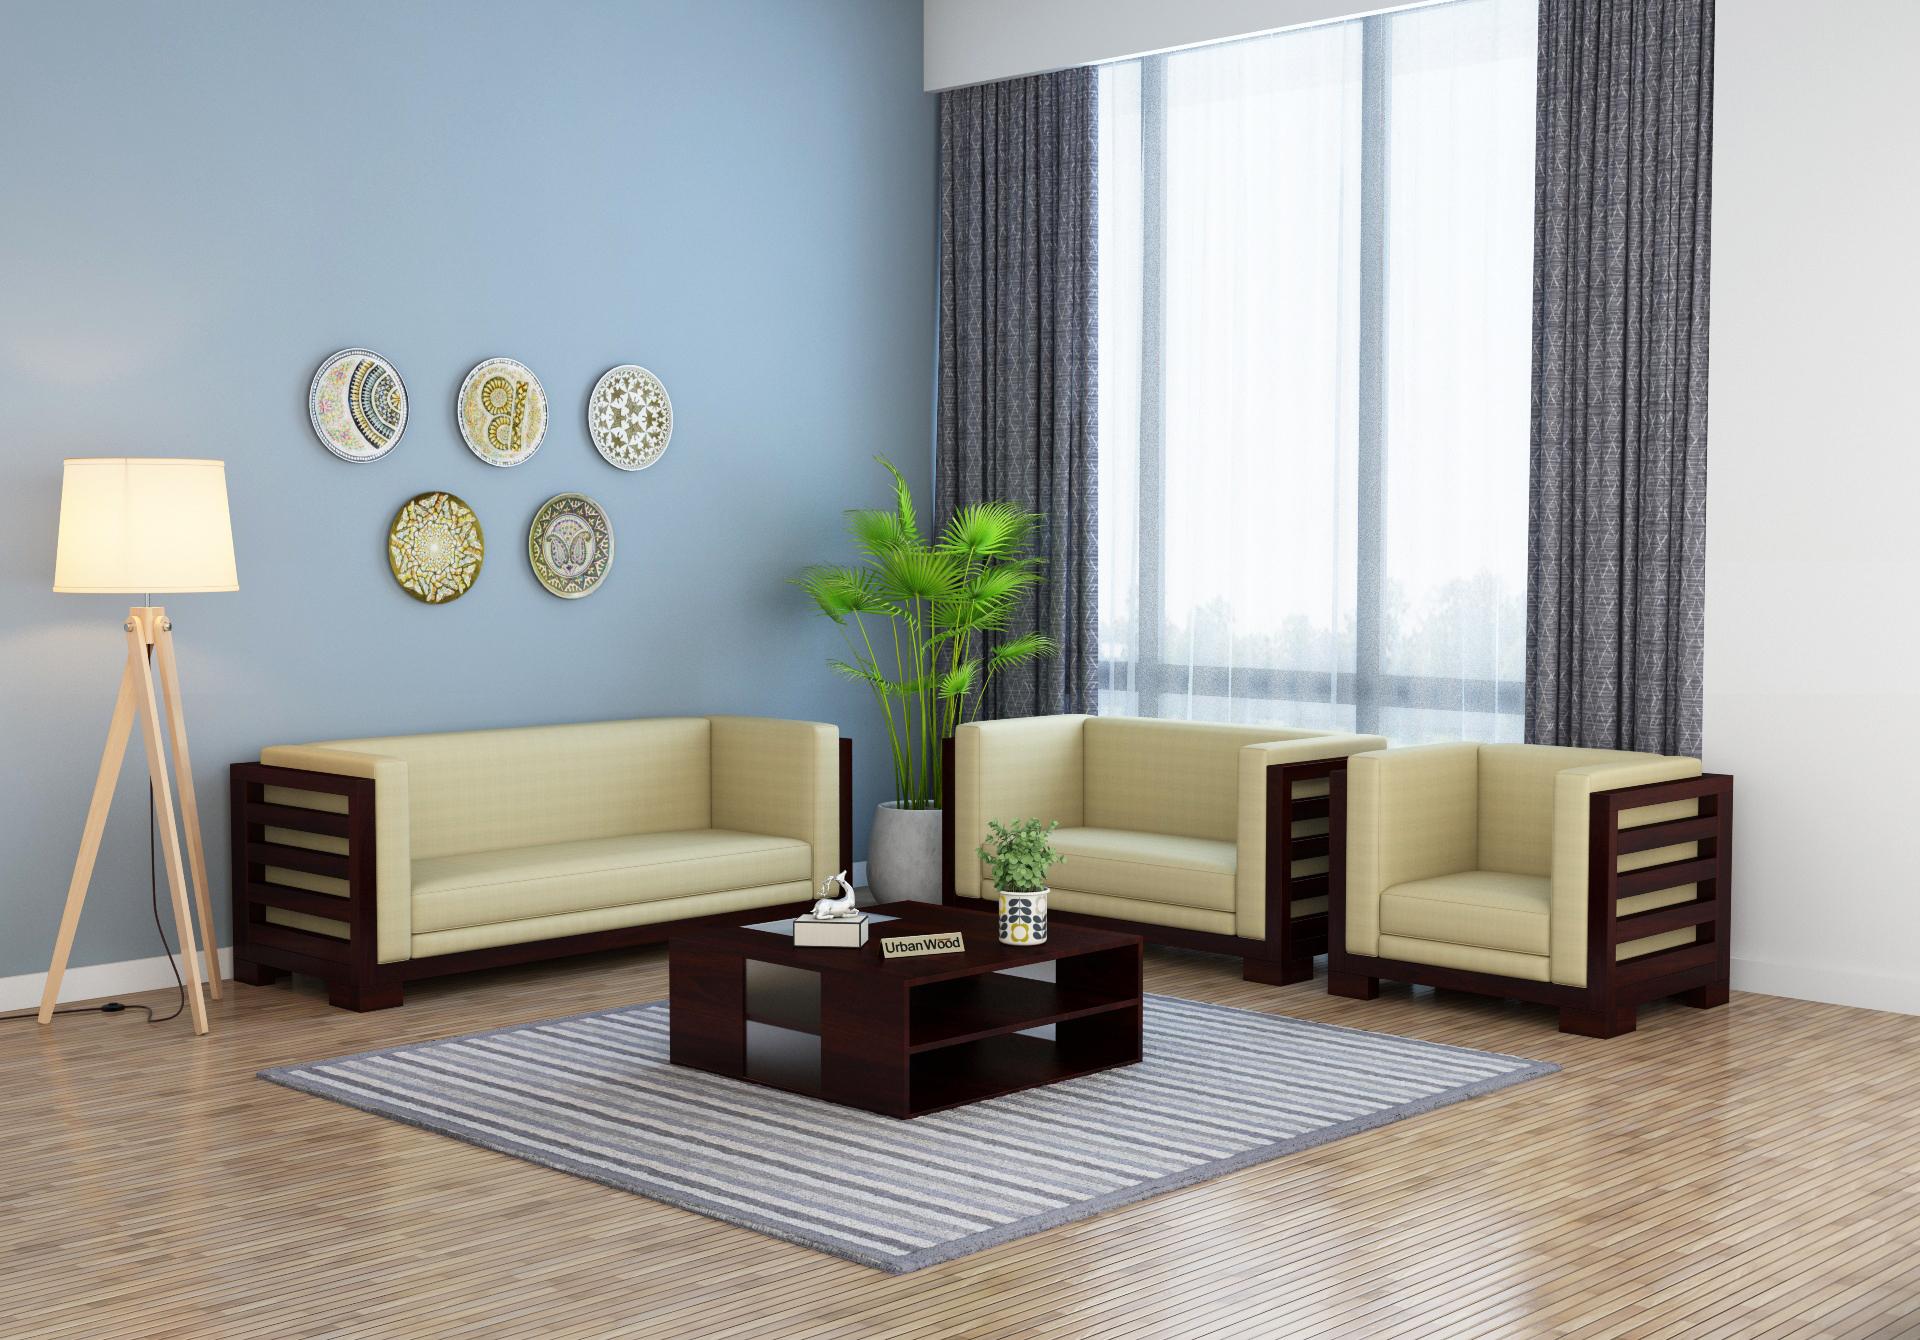 Modway Wooden Sofa Set <small>(3+2+1) Seater ( Walnut Finish )</small>